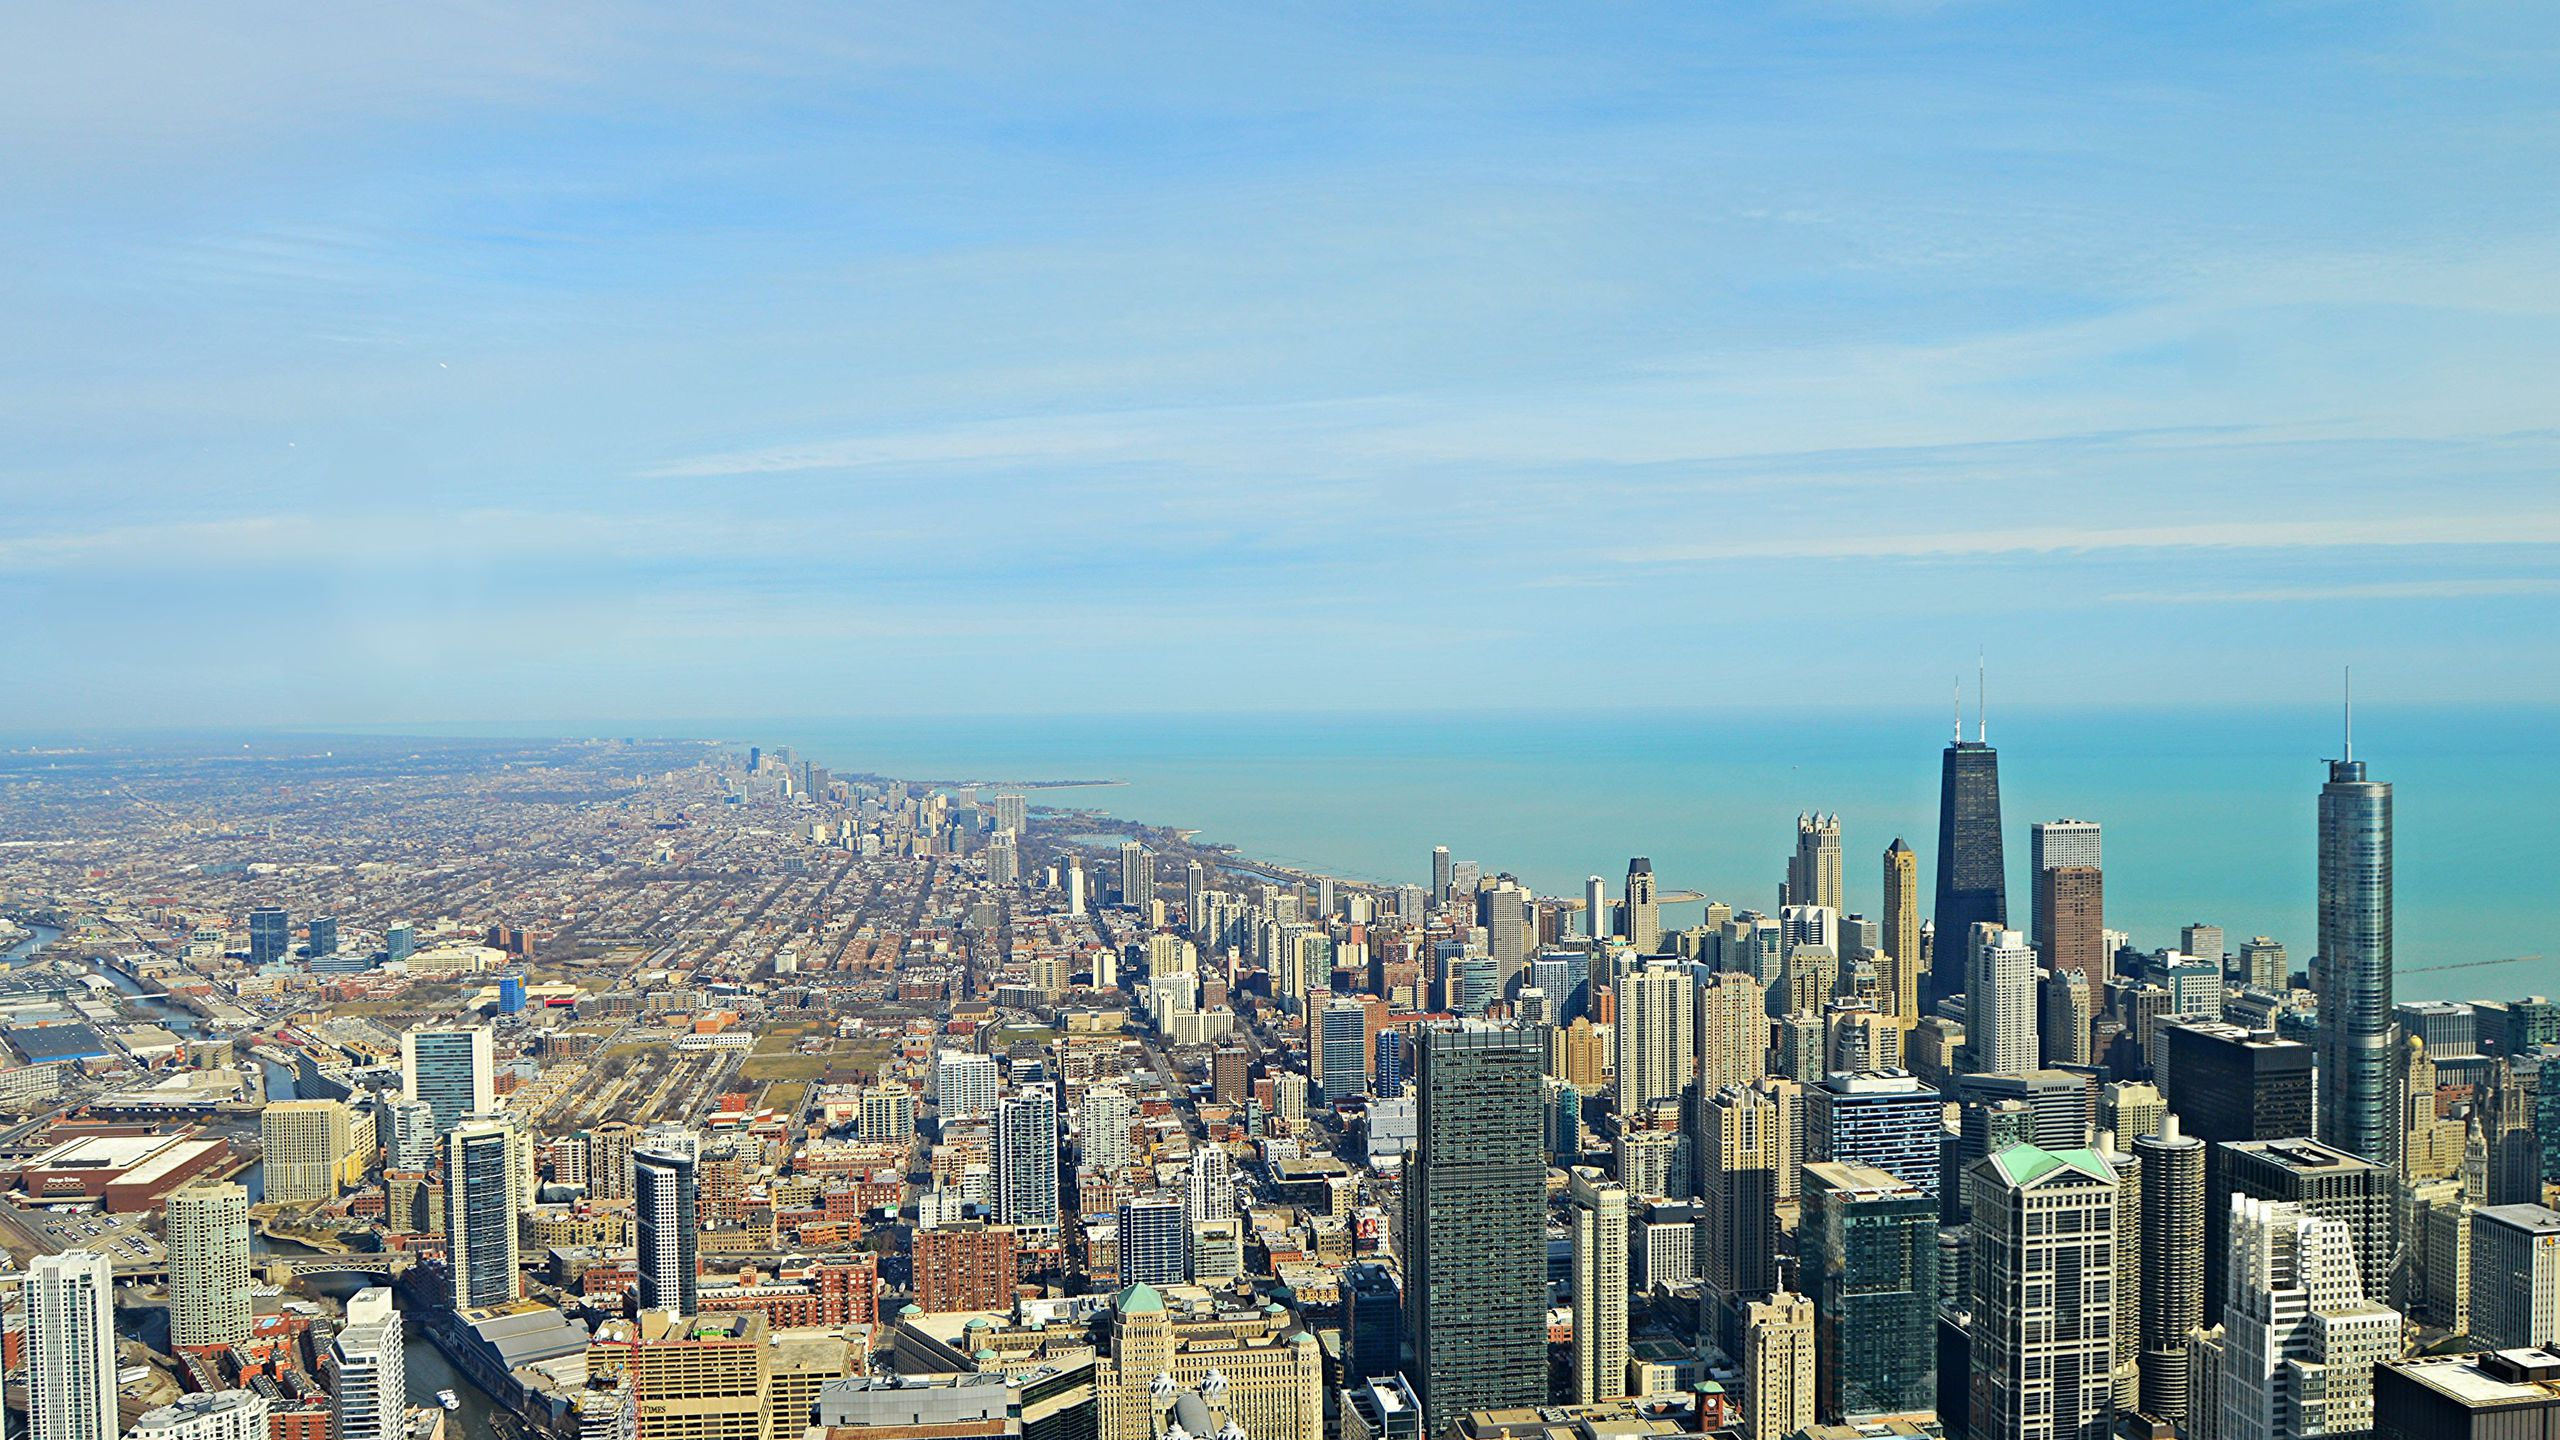 BOTPOST [BOT] Chicago looking north iimgurcom 2560x1440